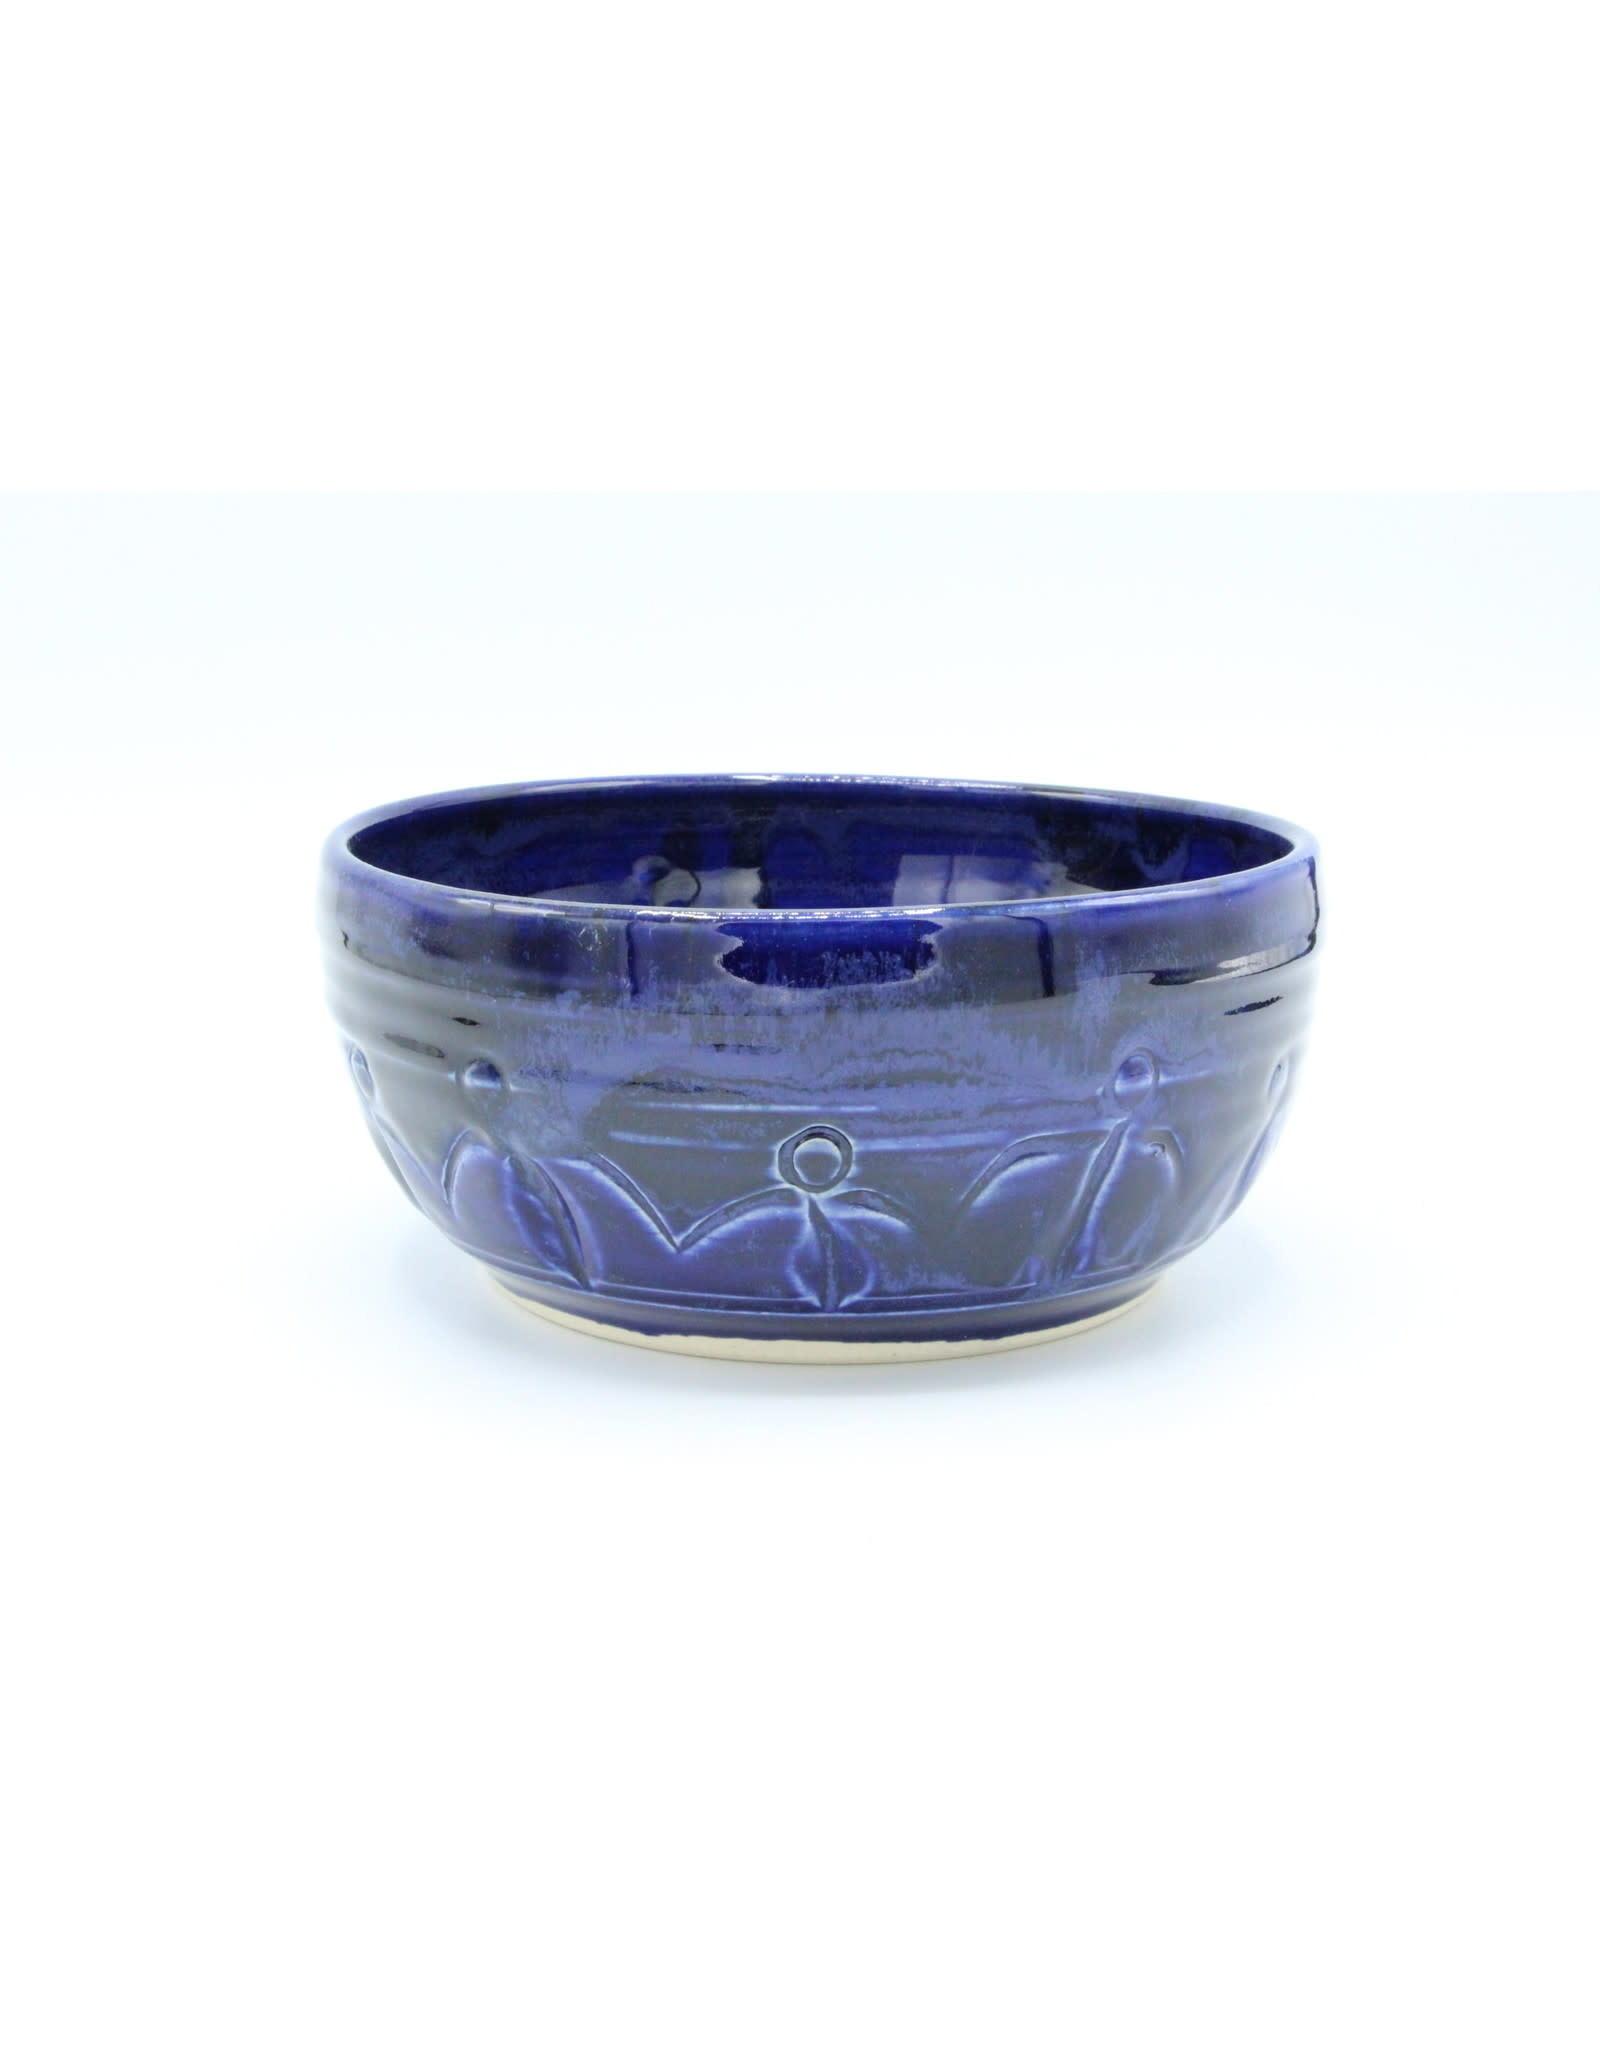 Medium Friendship Bowl - Cobalt